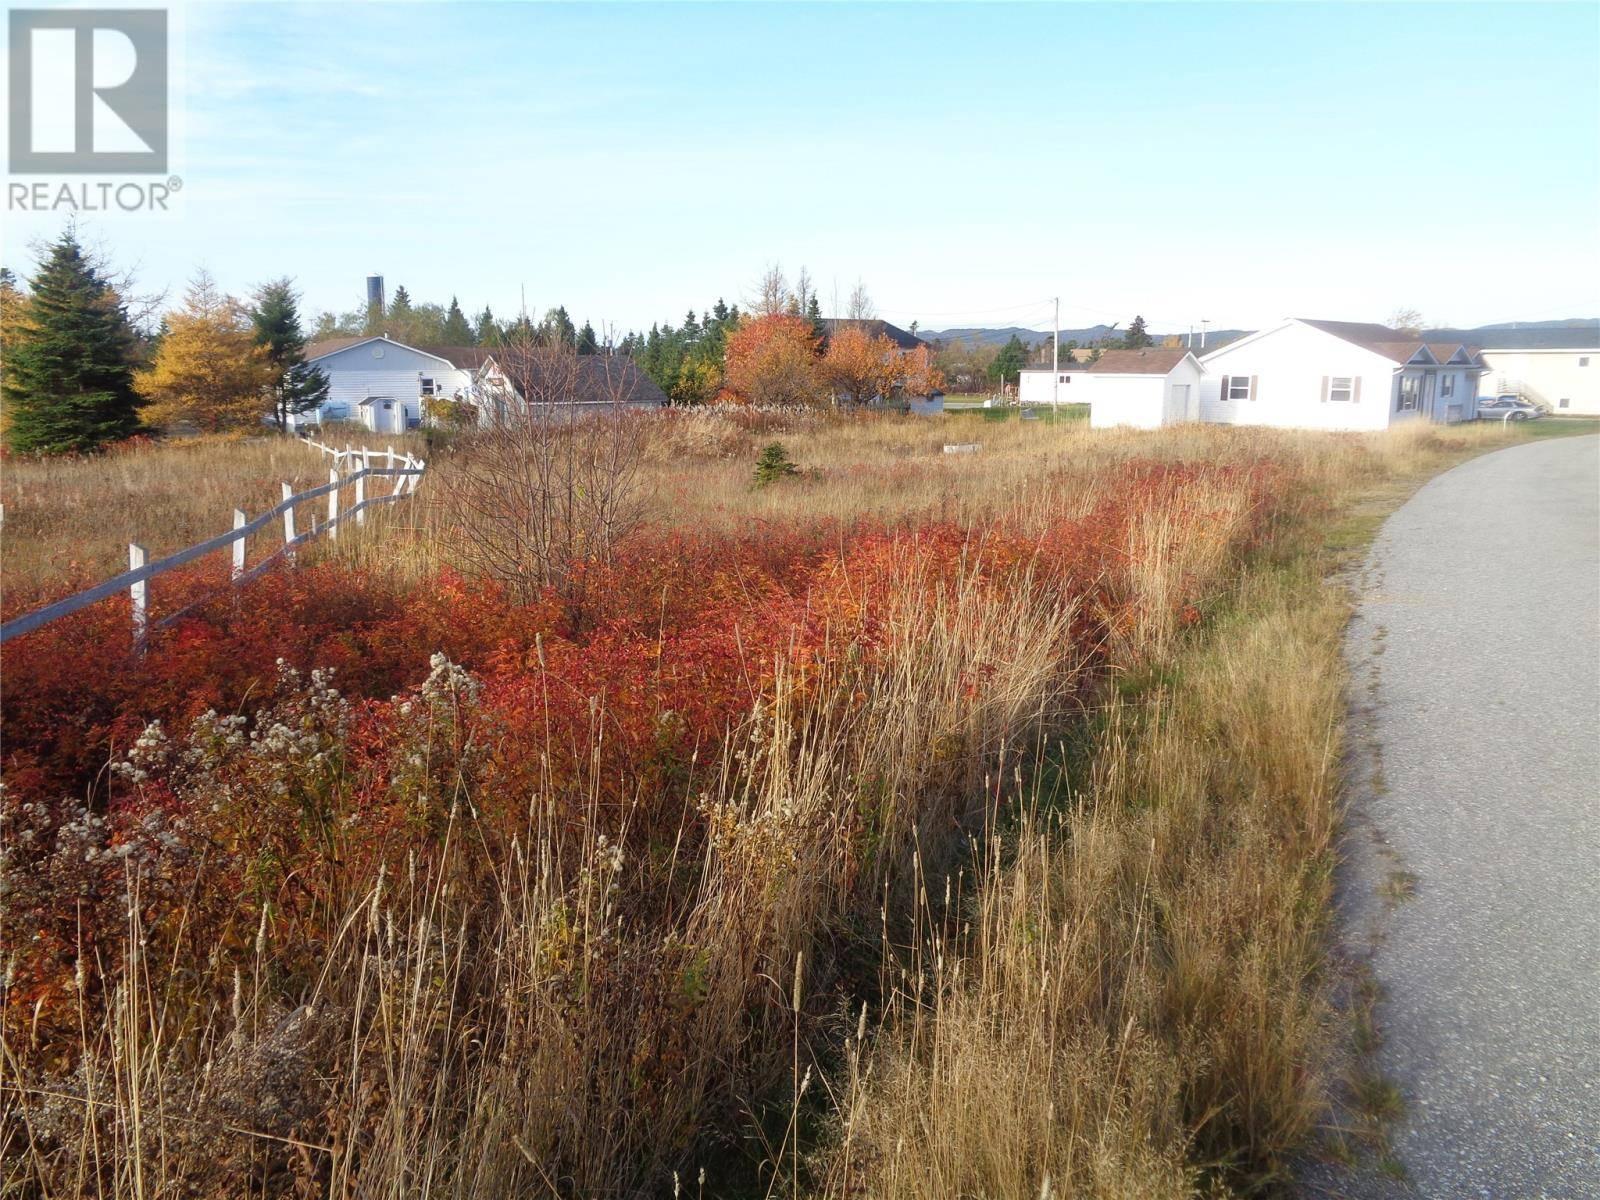 Home for sale at 4 Oakland Dr Stephenville Crossing Newfoundland - MLS: 1200497